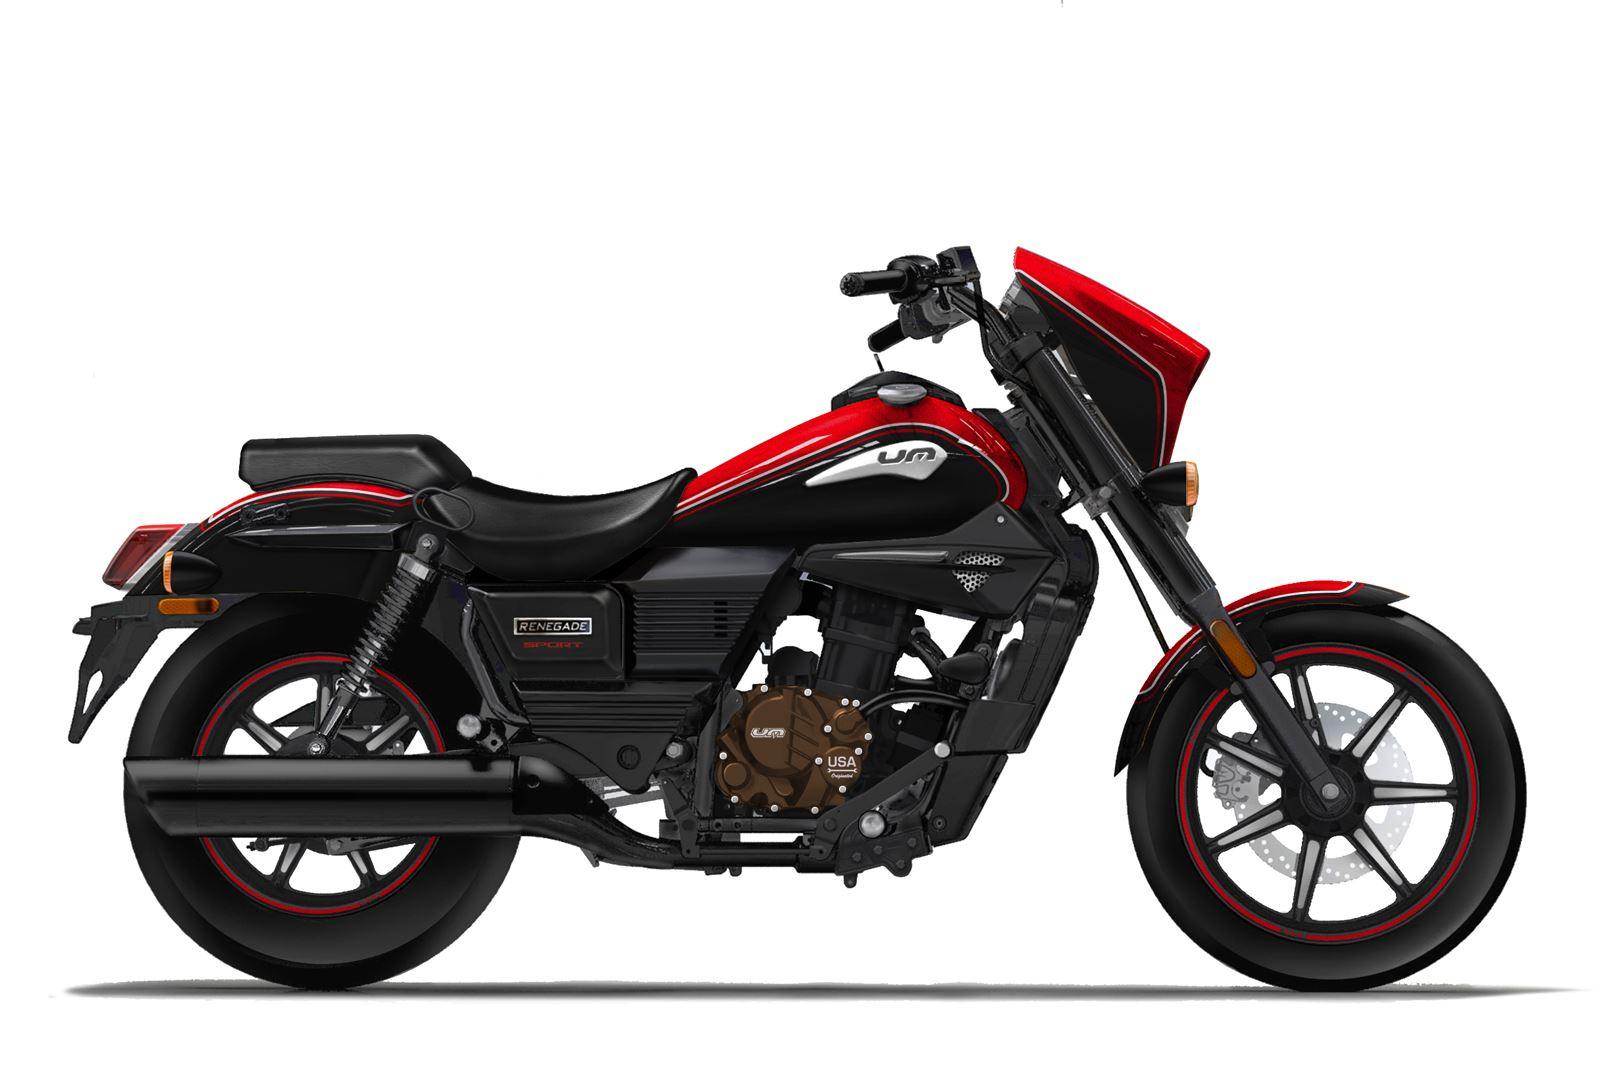 um renegade sport s moto cruiser andar de moto. Black Bedroom Furniture Sets. Home Design Ideas